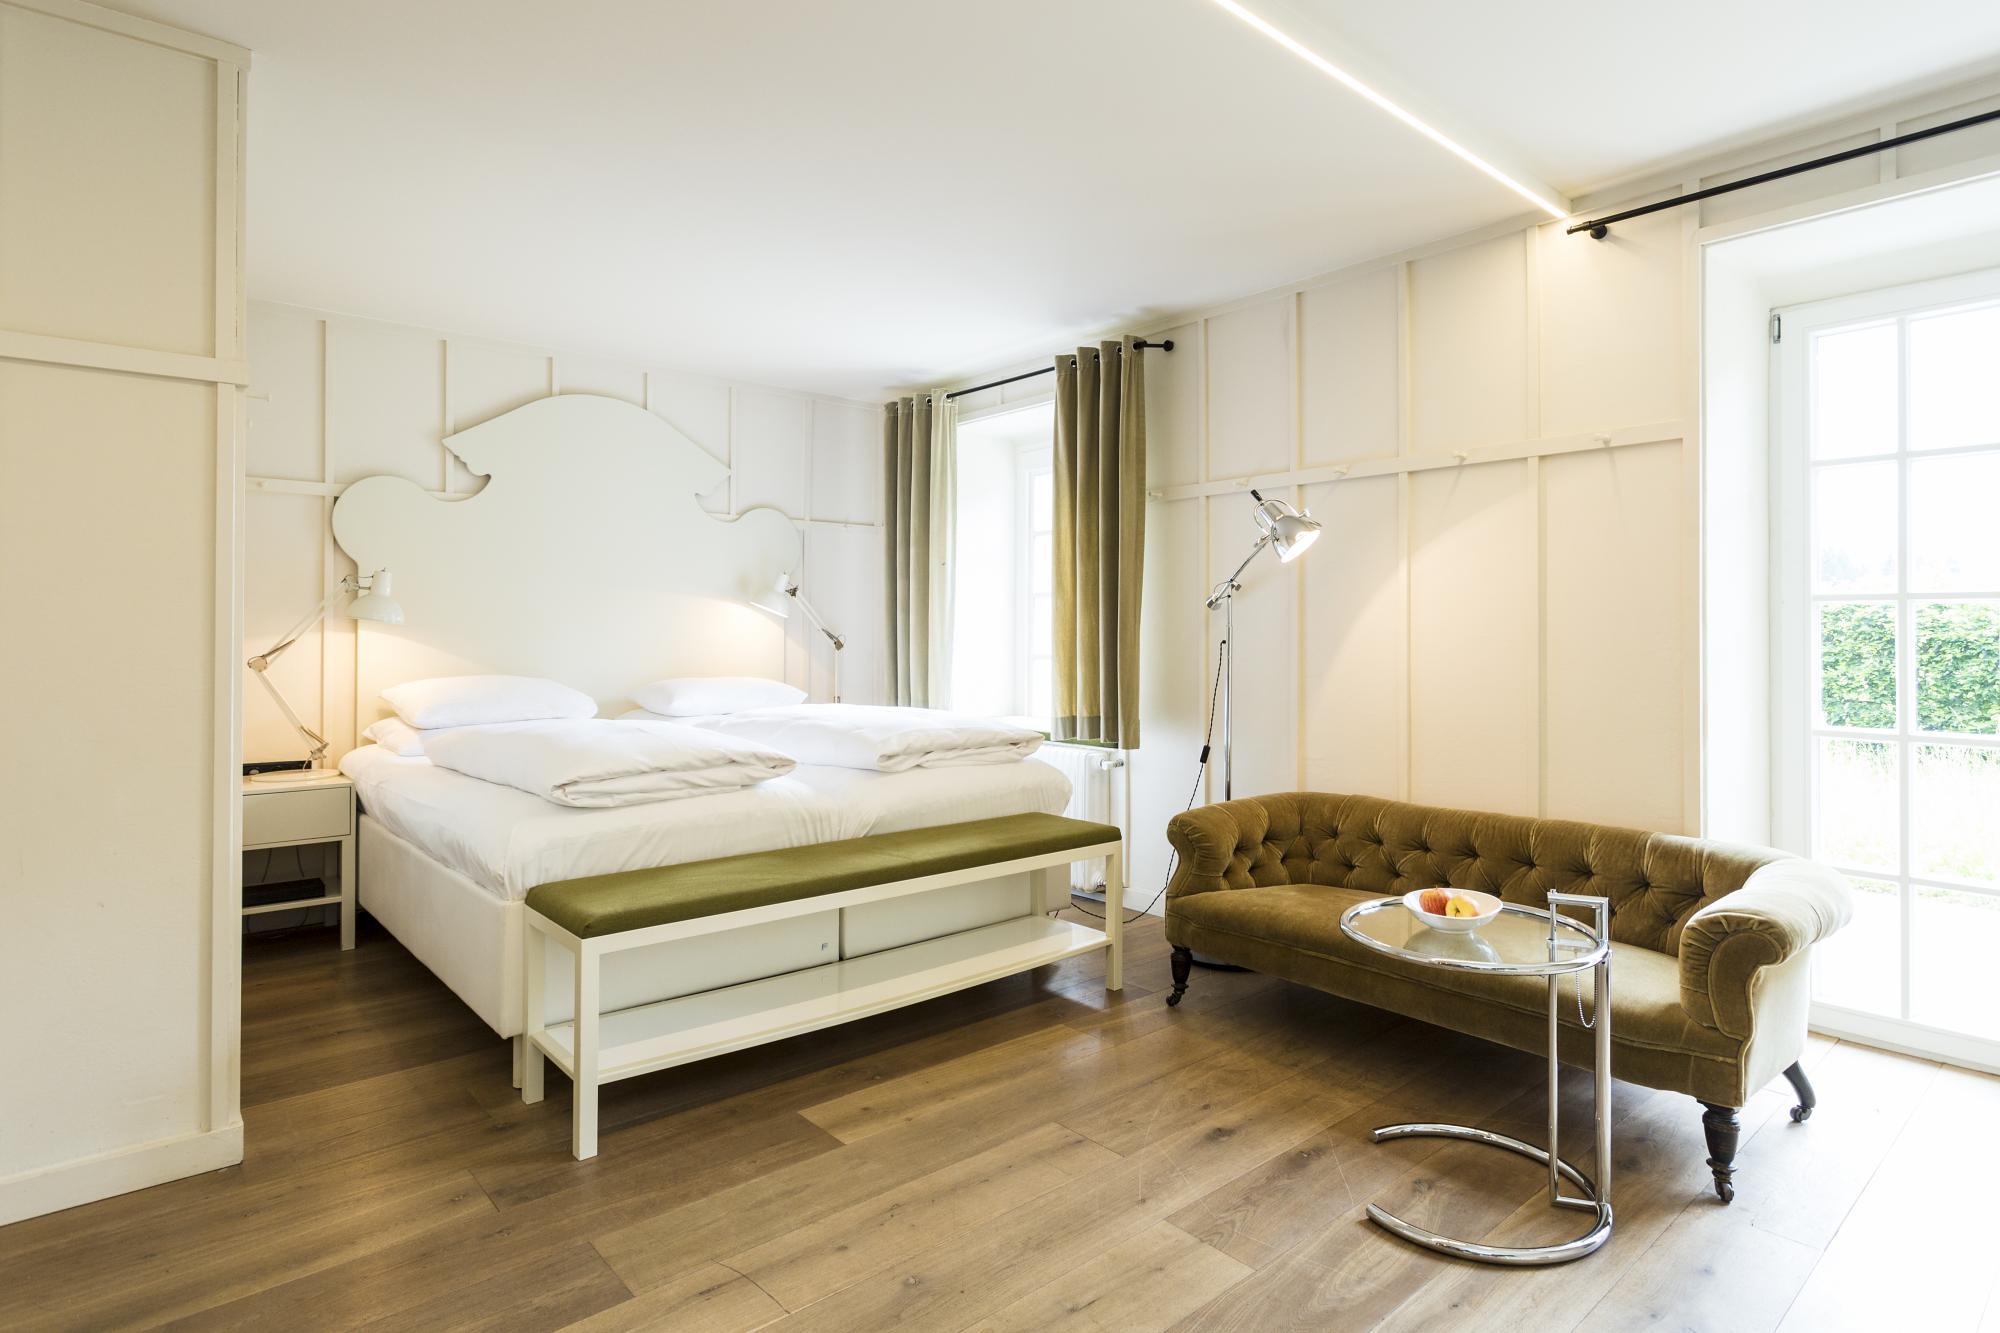 das kranzbach kr n. Black Bedroom Furniture Sets. Home Design Ideas